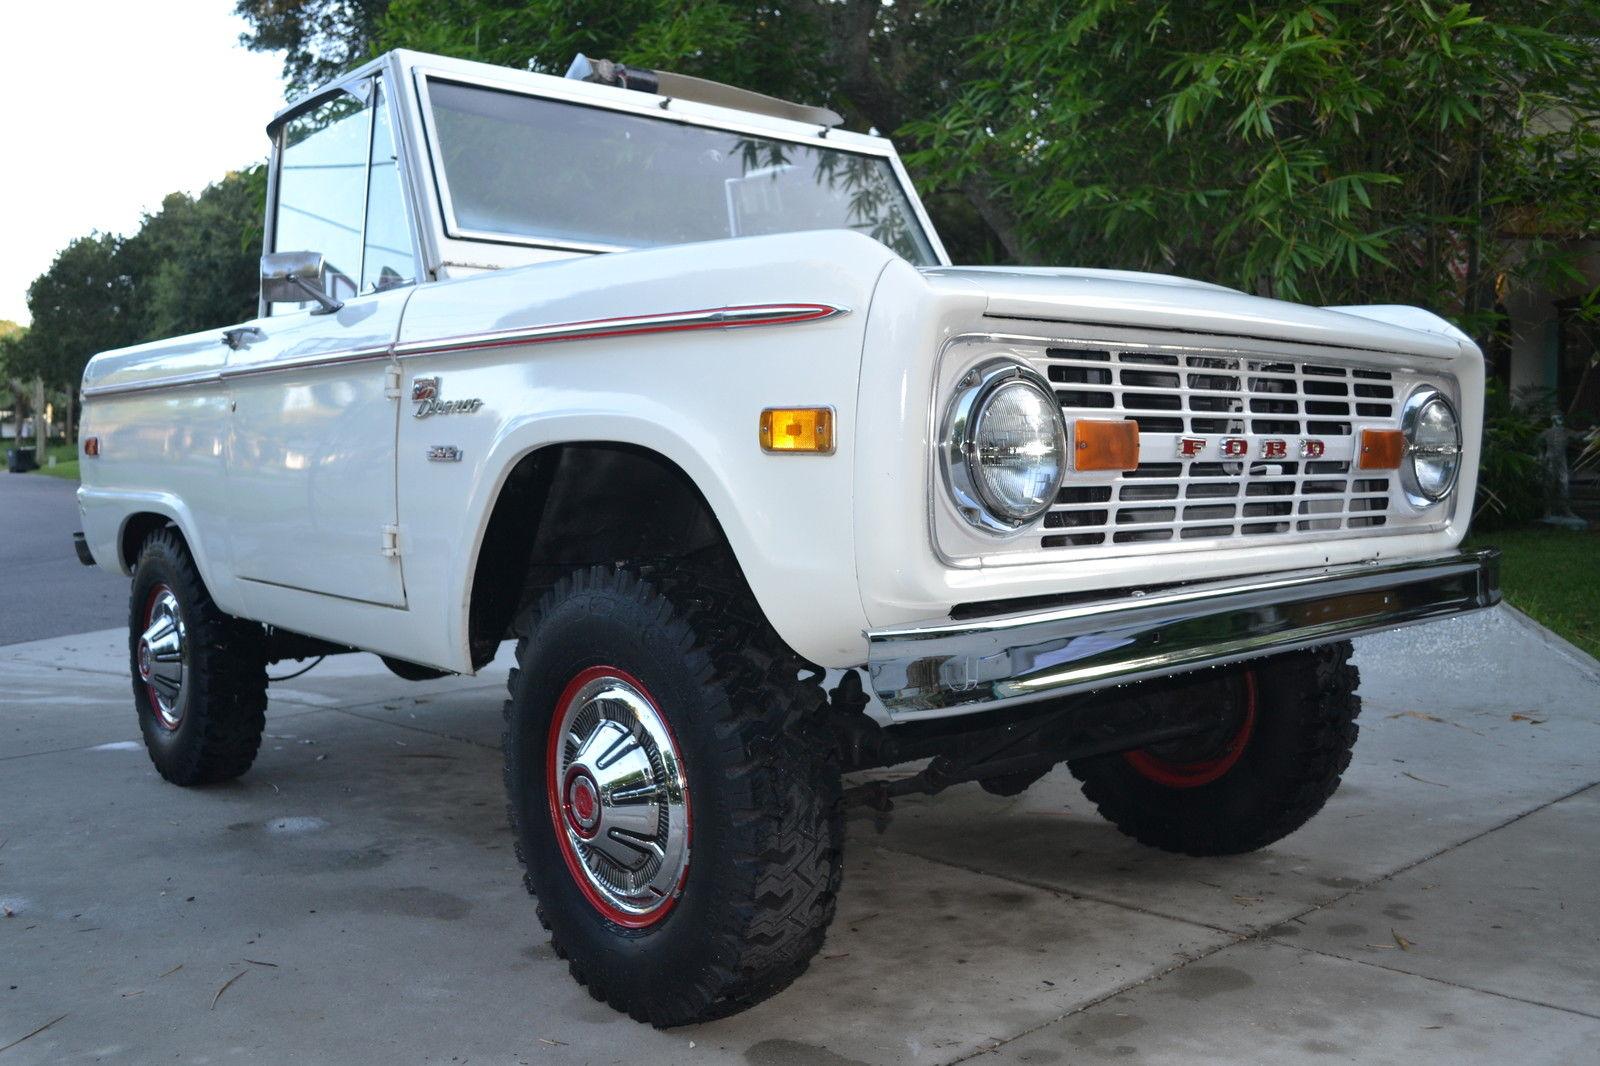 1975 ford bronco ranger 2 door compact suv